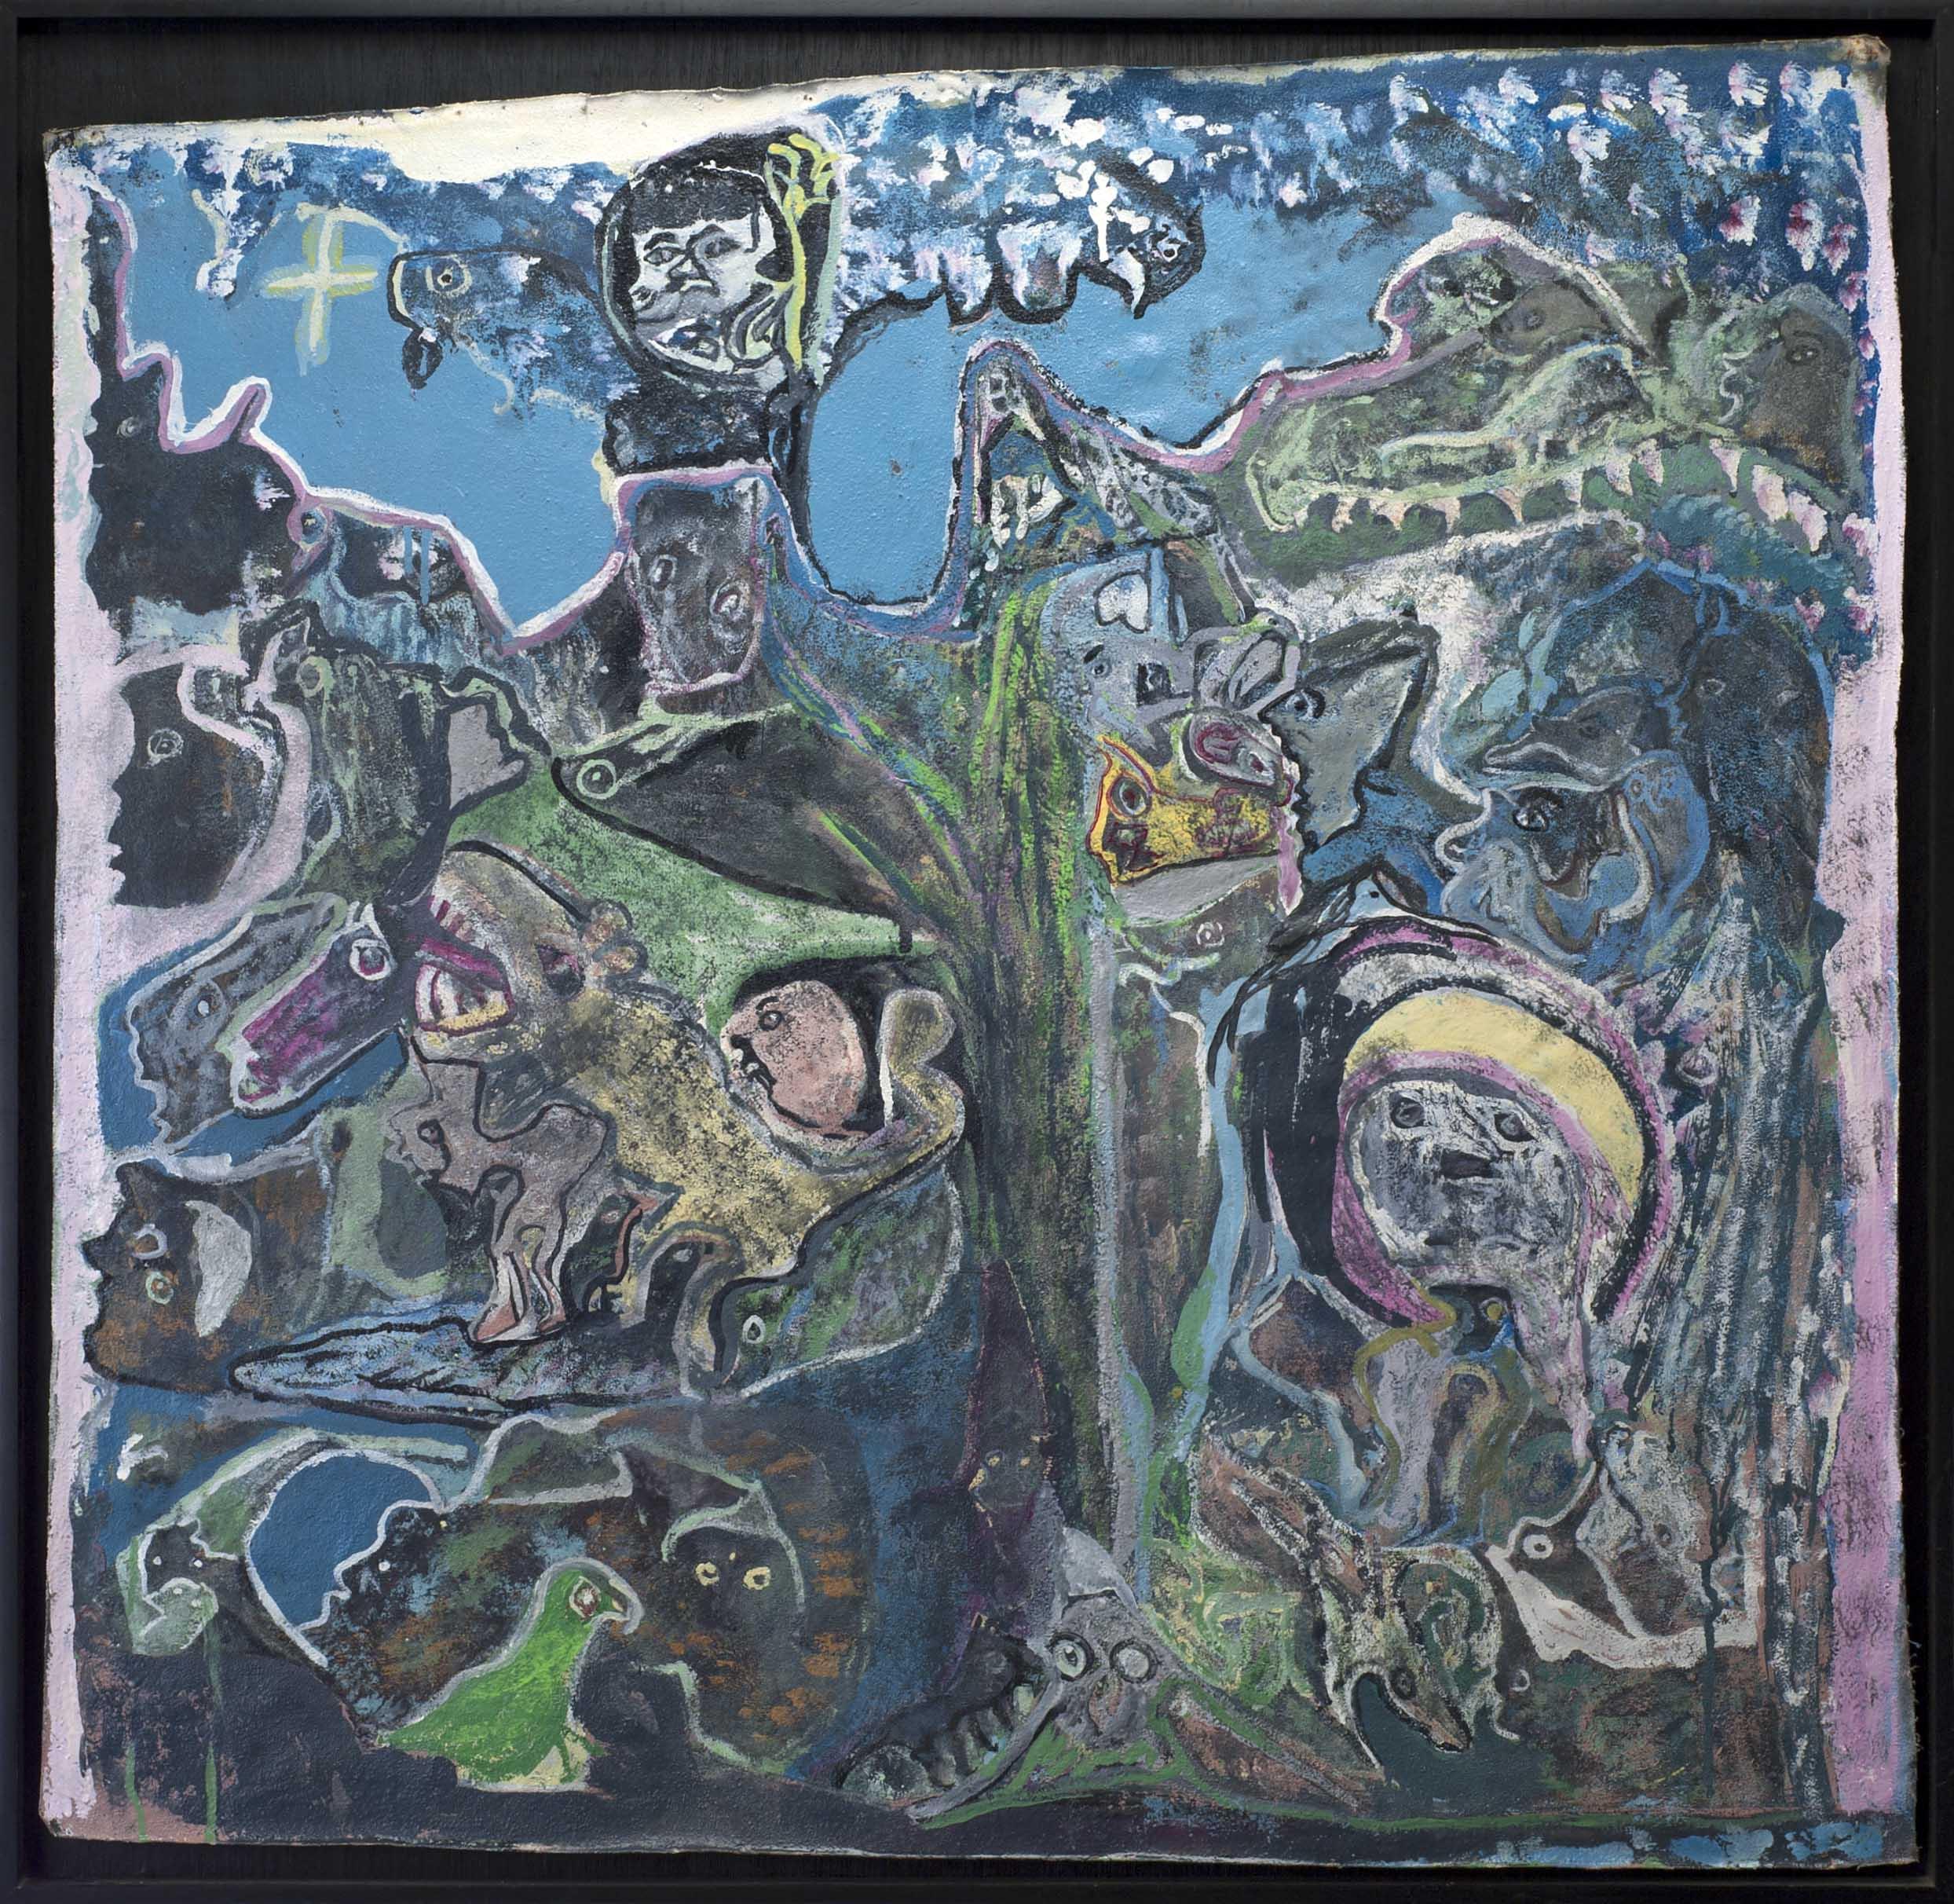 Leonard Daley Con Teng Qual Dalok Amanda, 1996 Mixed media on canvas 33.5 x 36.75 inches 85.1 x 93.3 cm LE 21